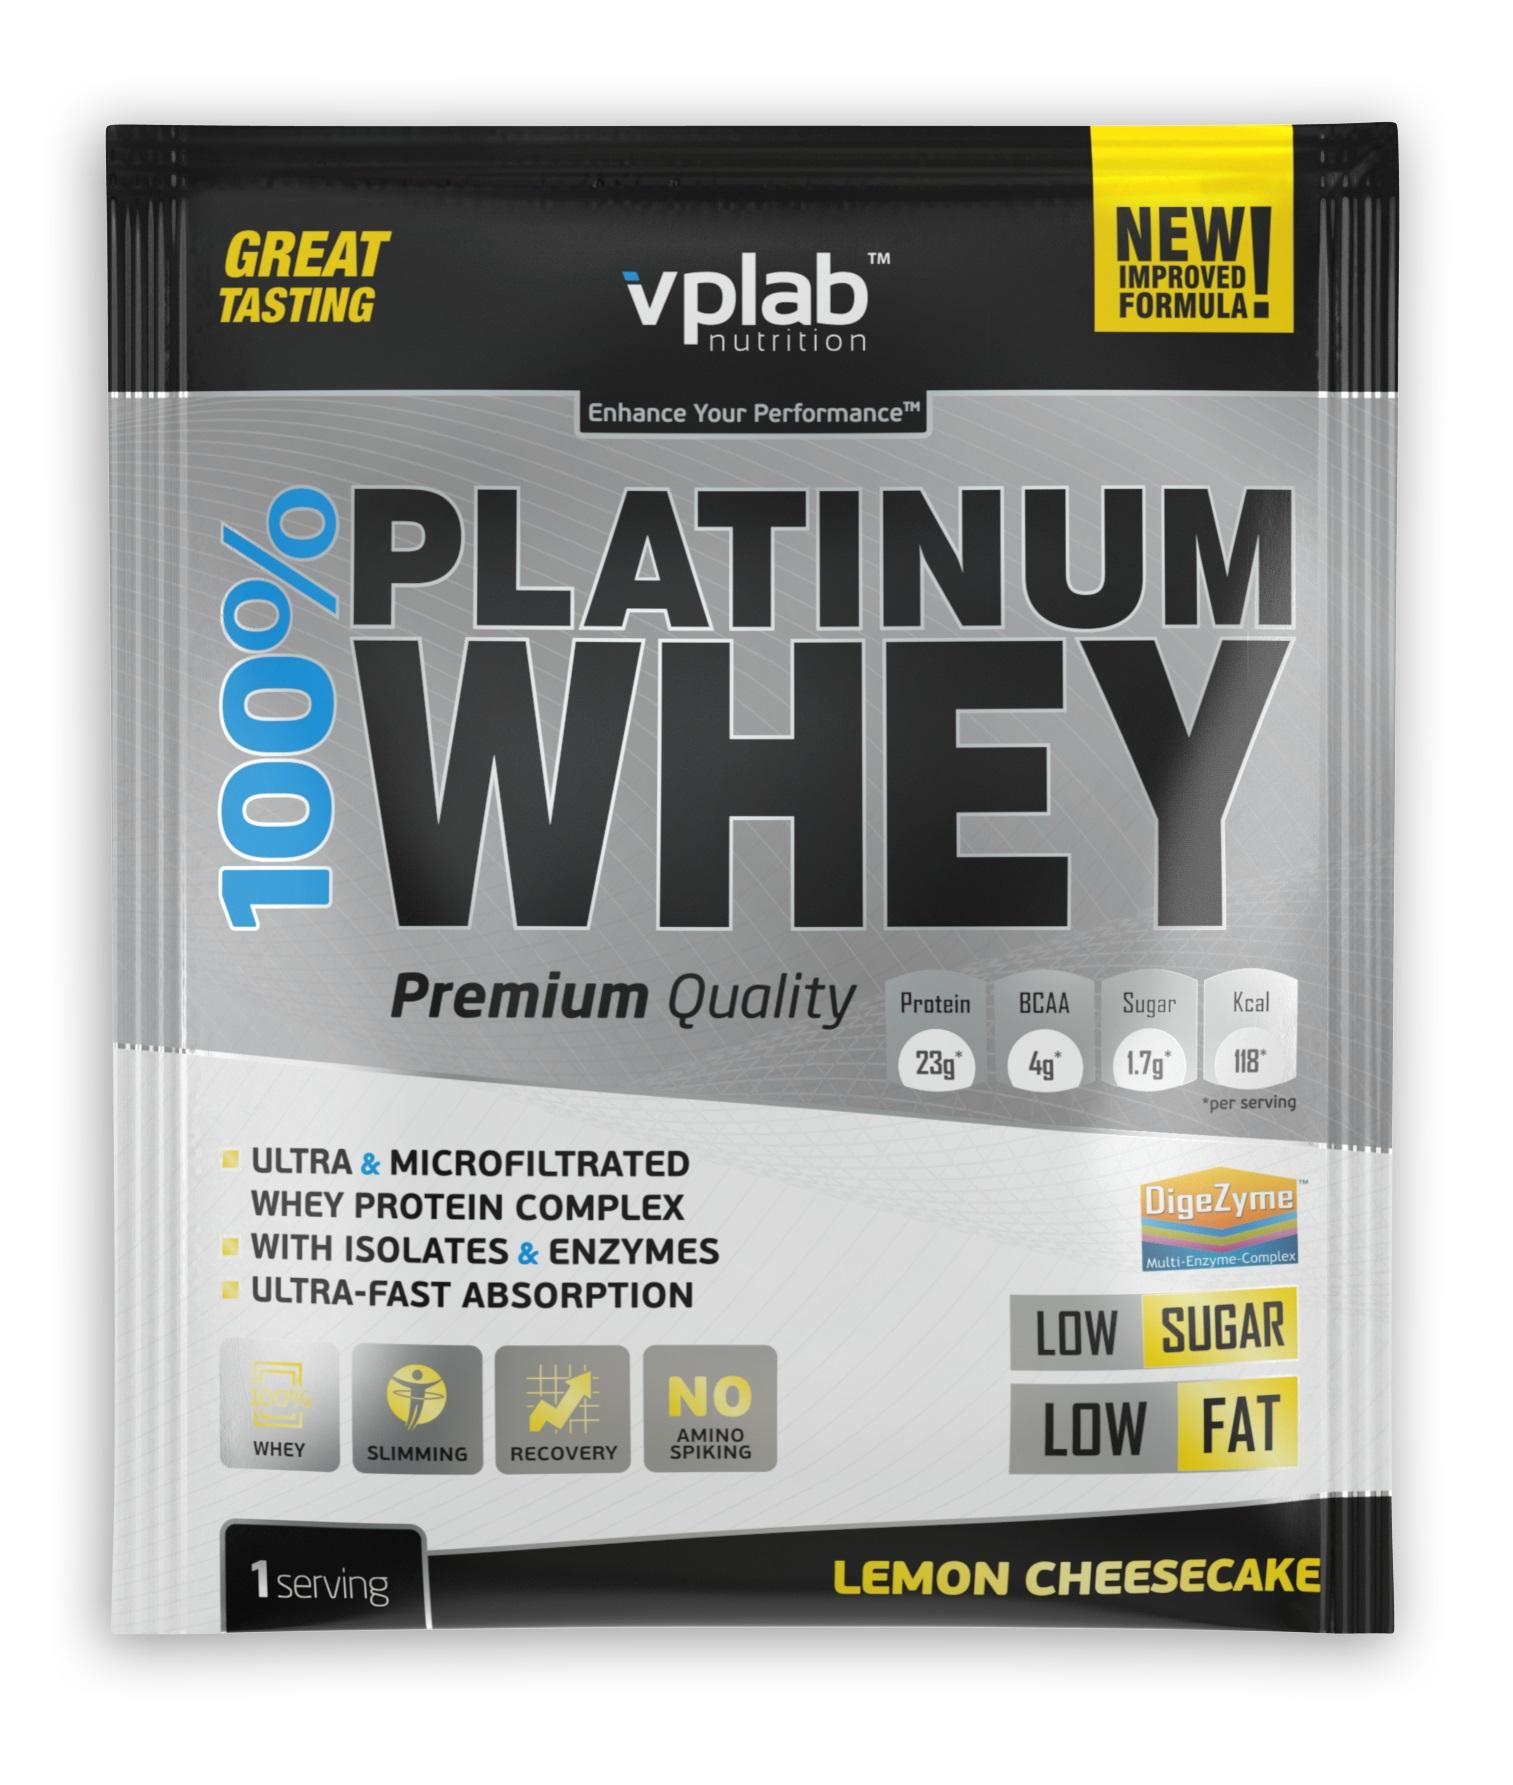 Vplab nutrition Протеин nutrition, лимонный чизкейк